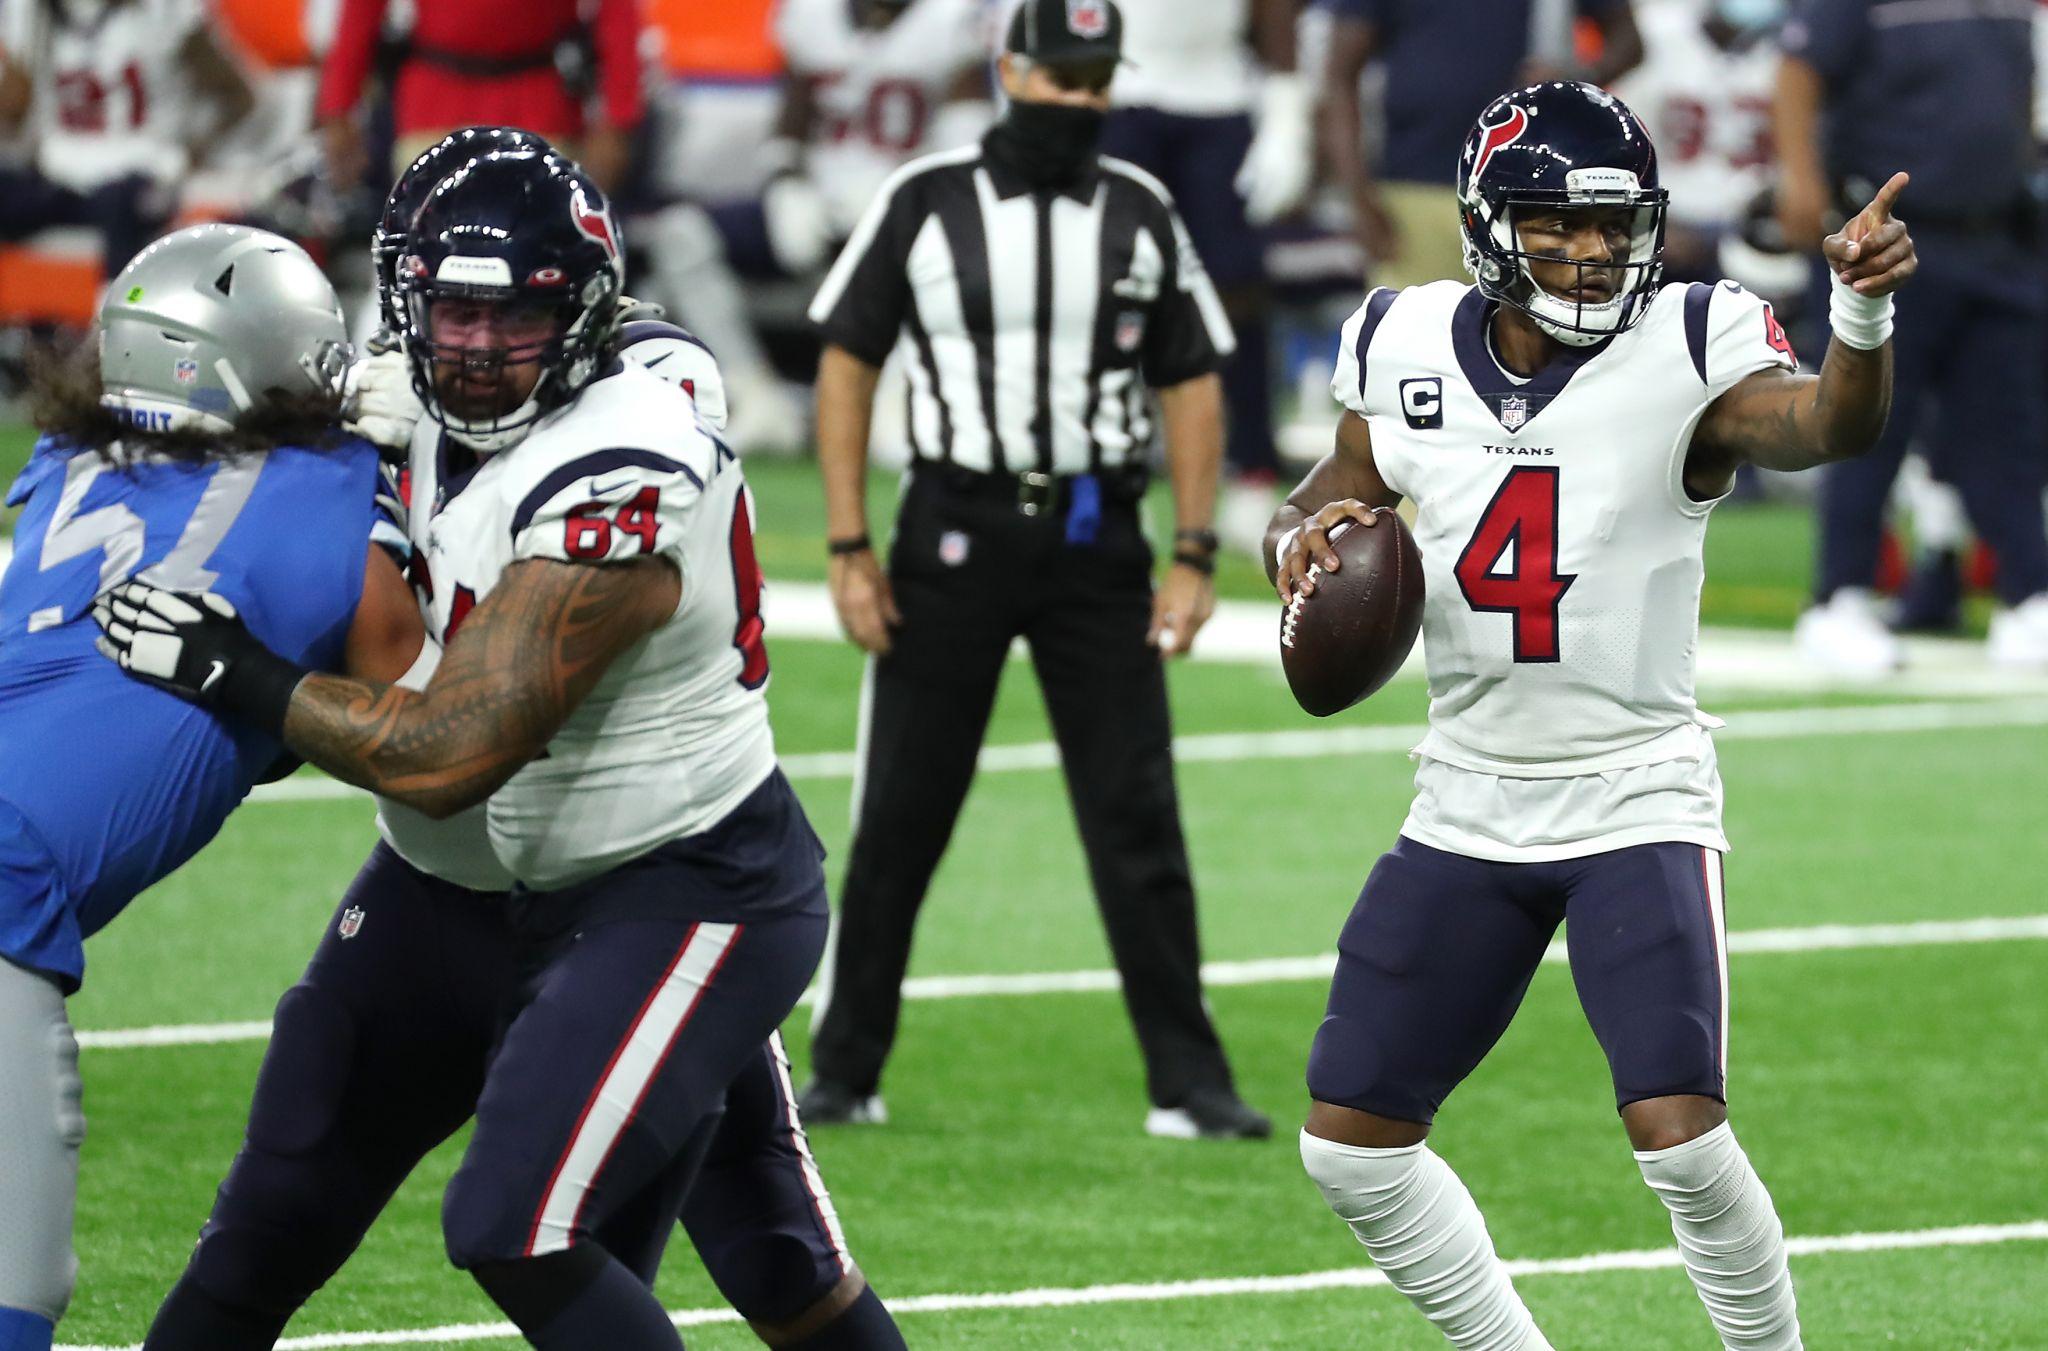 McClain: Texans' Deshaun Watson on pace for unprecedented year